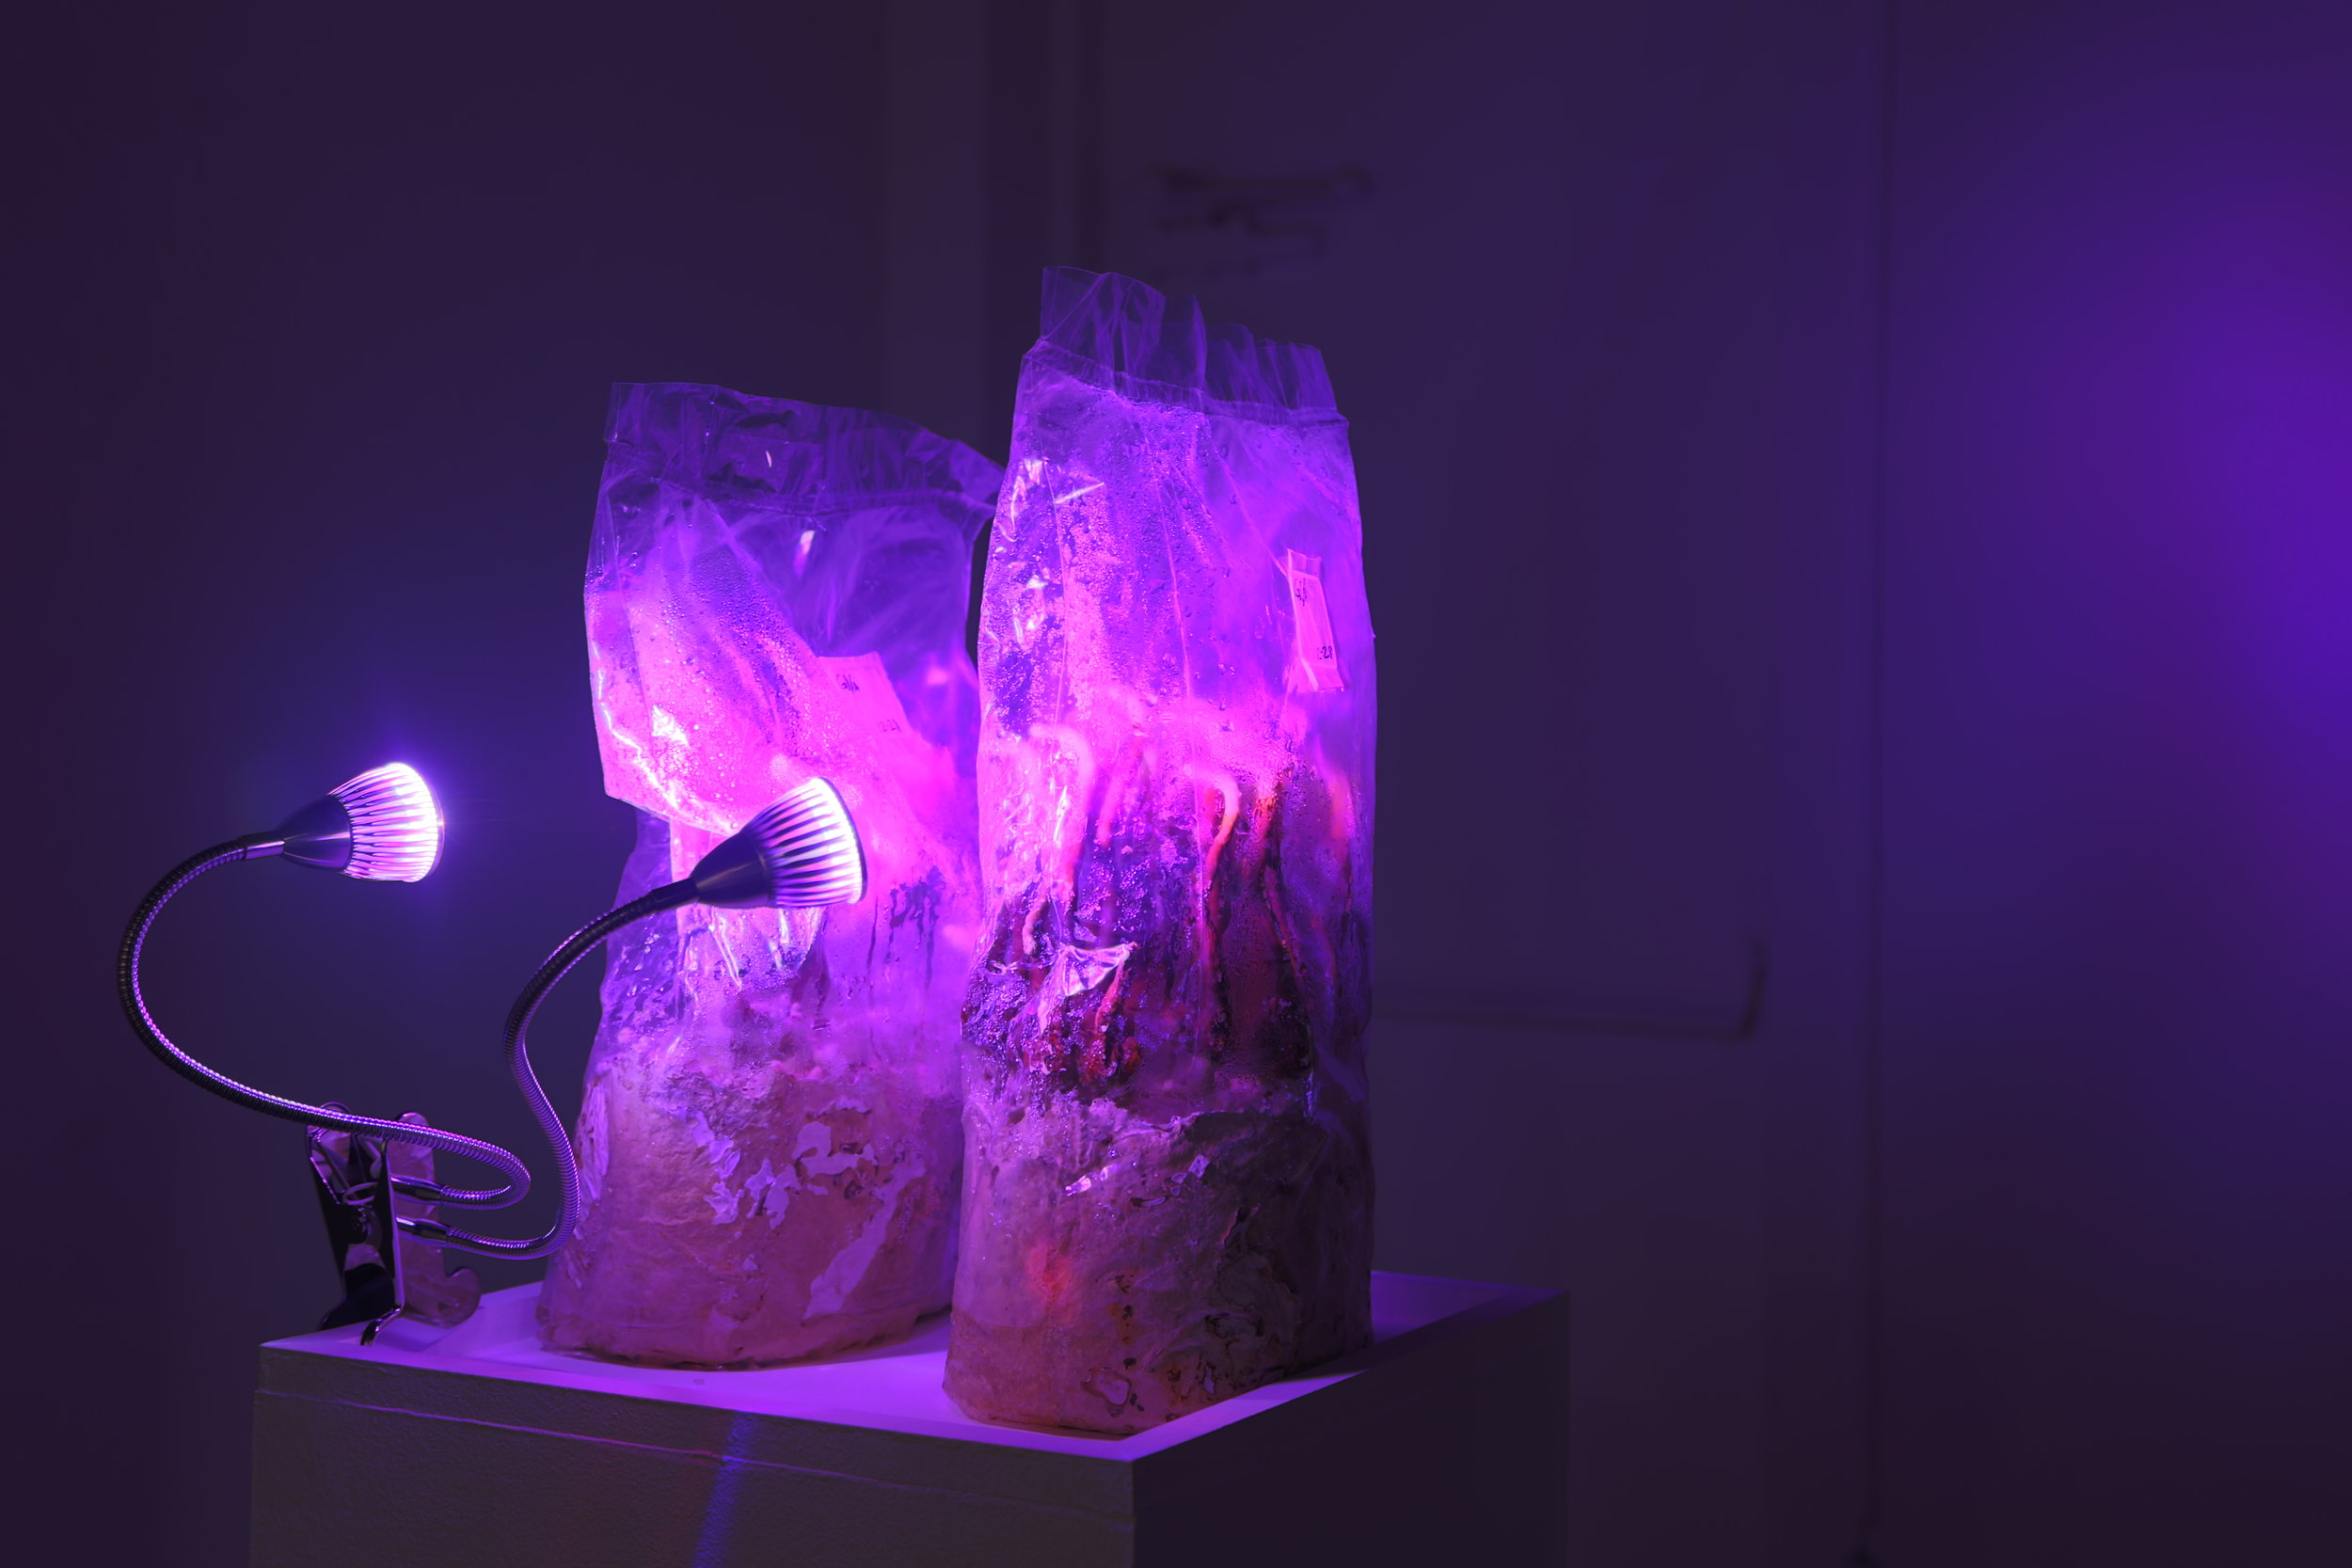 thesis-reishi mushroom kit, led grow light.JPG